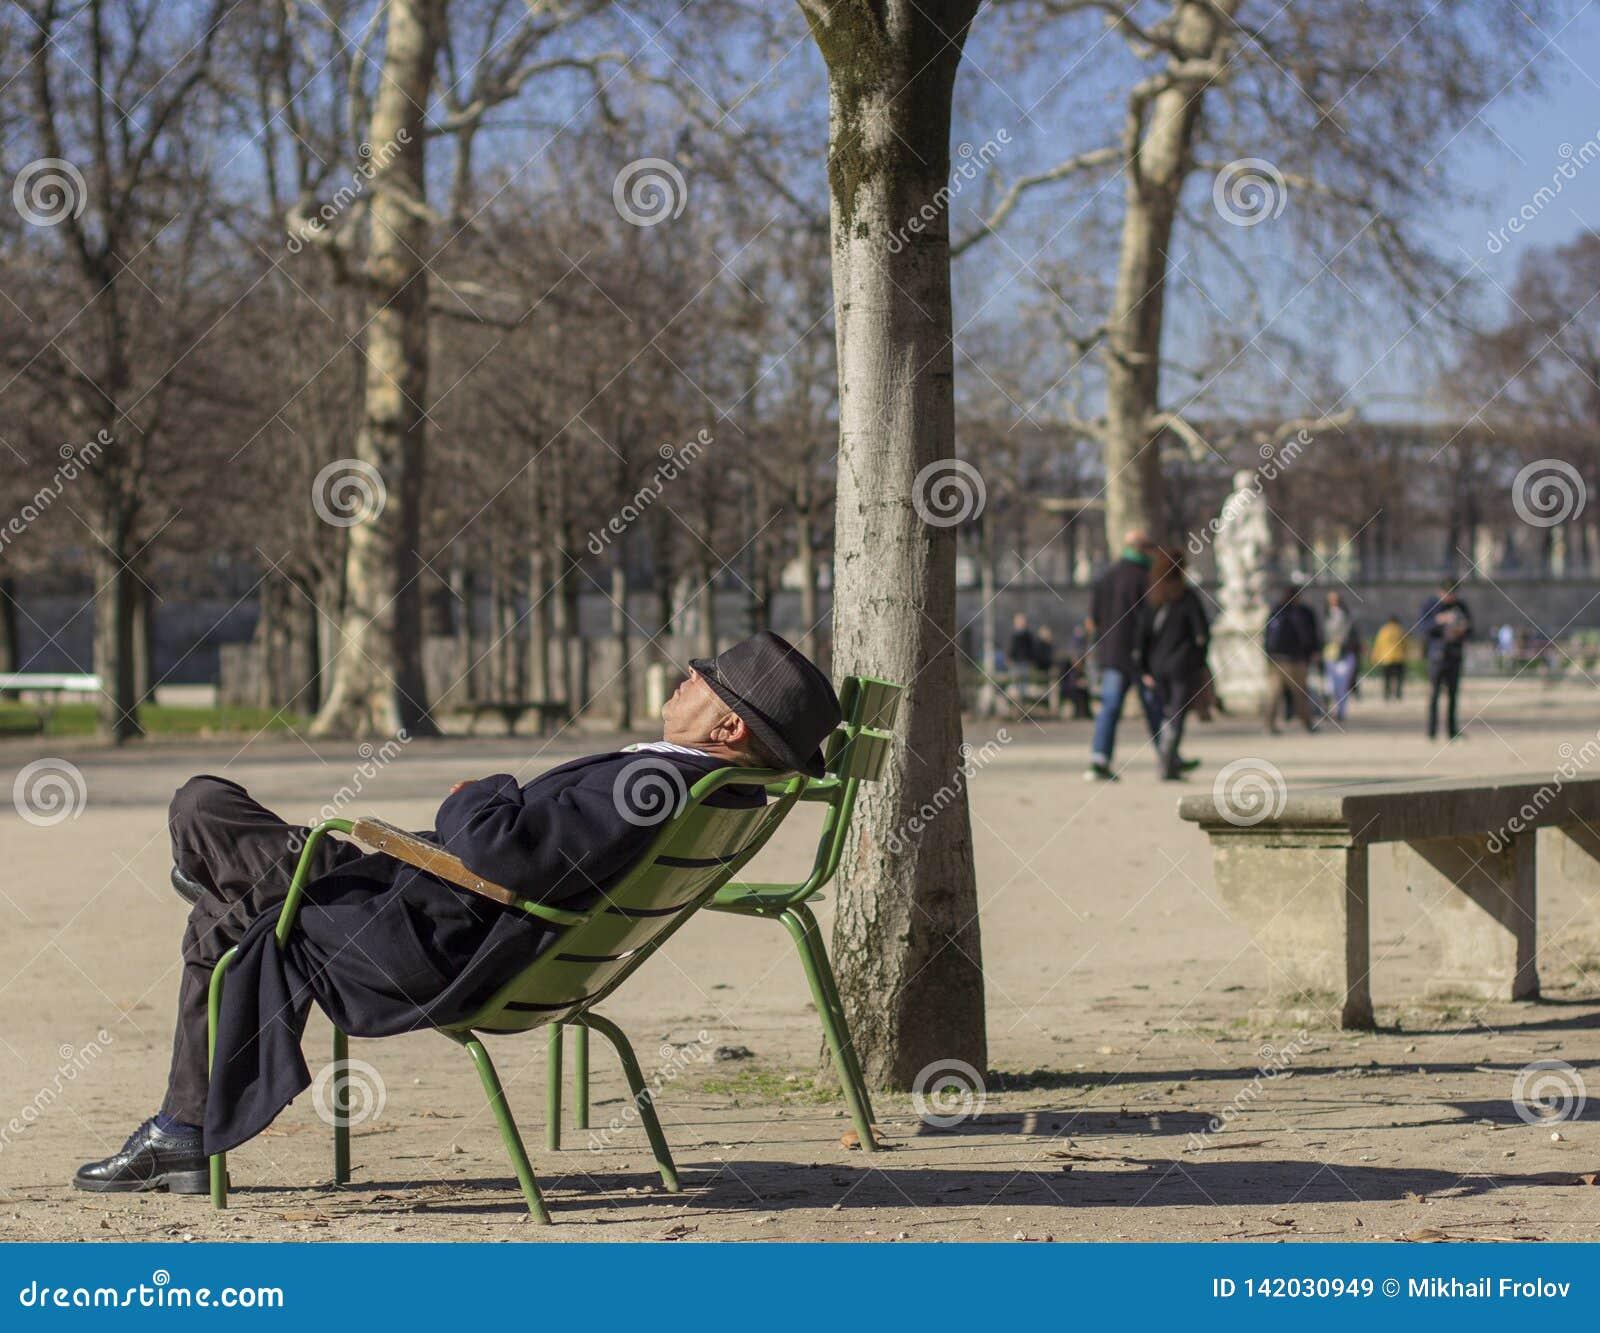 An elderly man in a hat is sleeping in the sun in the park